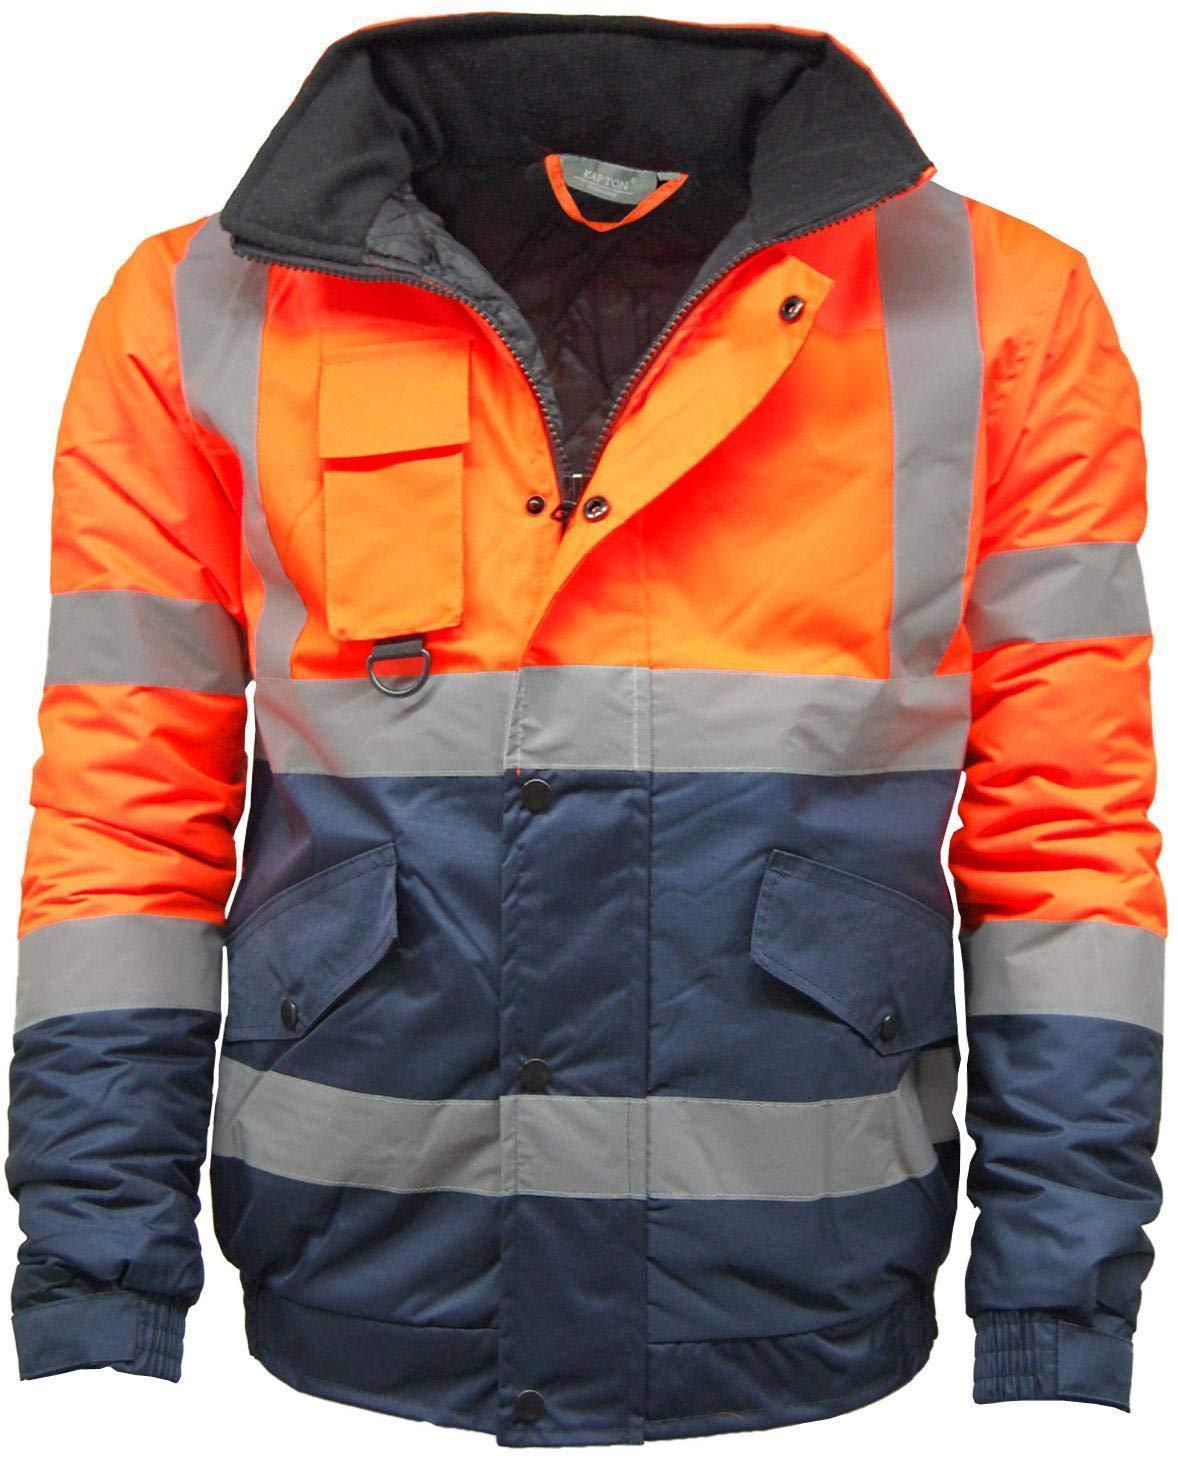 KAPTON. Mens Waterproof Hi Visibility Two Tone Safety Quilted Bomber Jacket Standard Safety Work Wear Jackets Orange/Navy XXXXX-Large